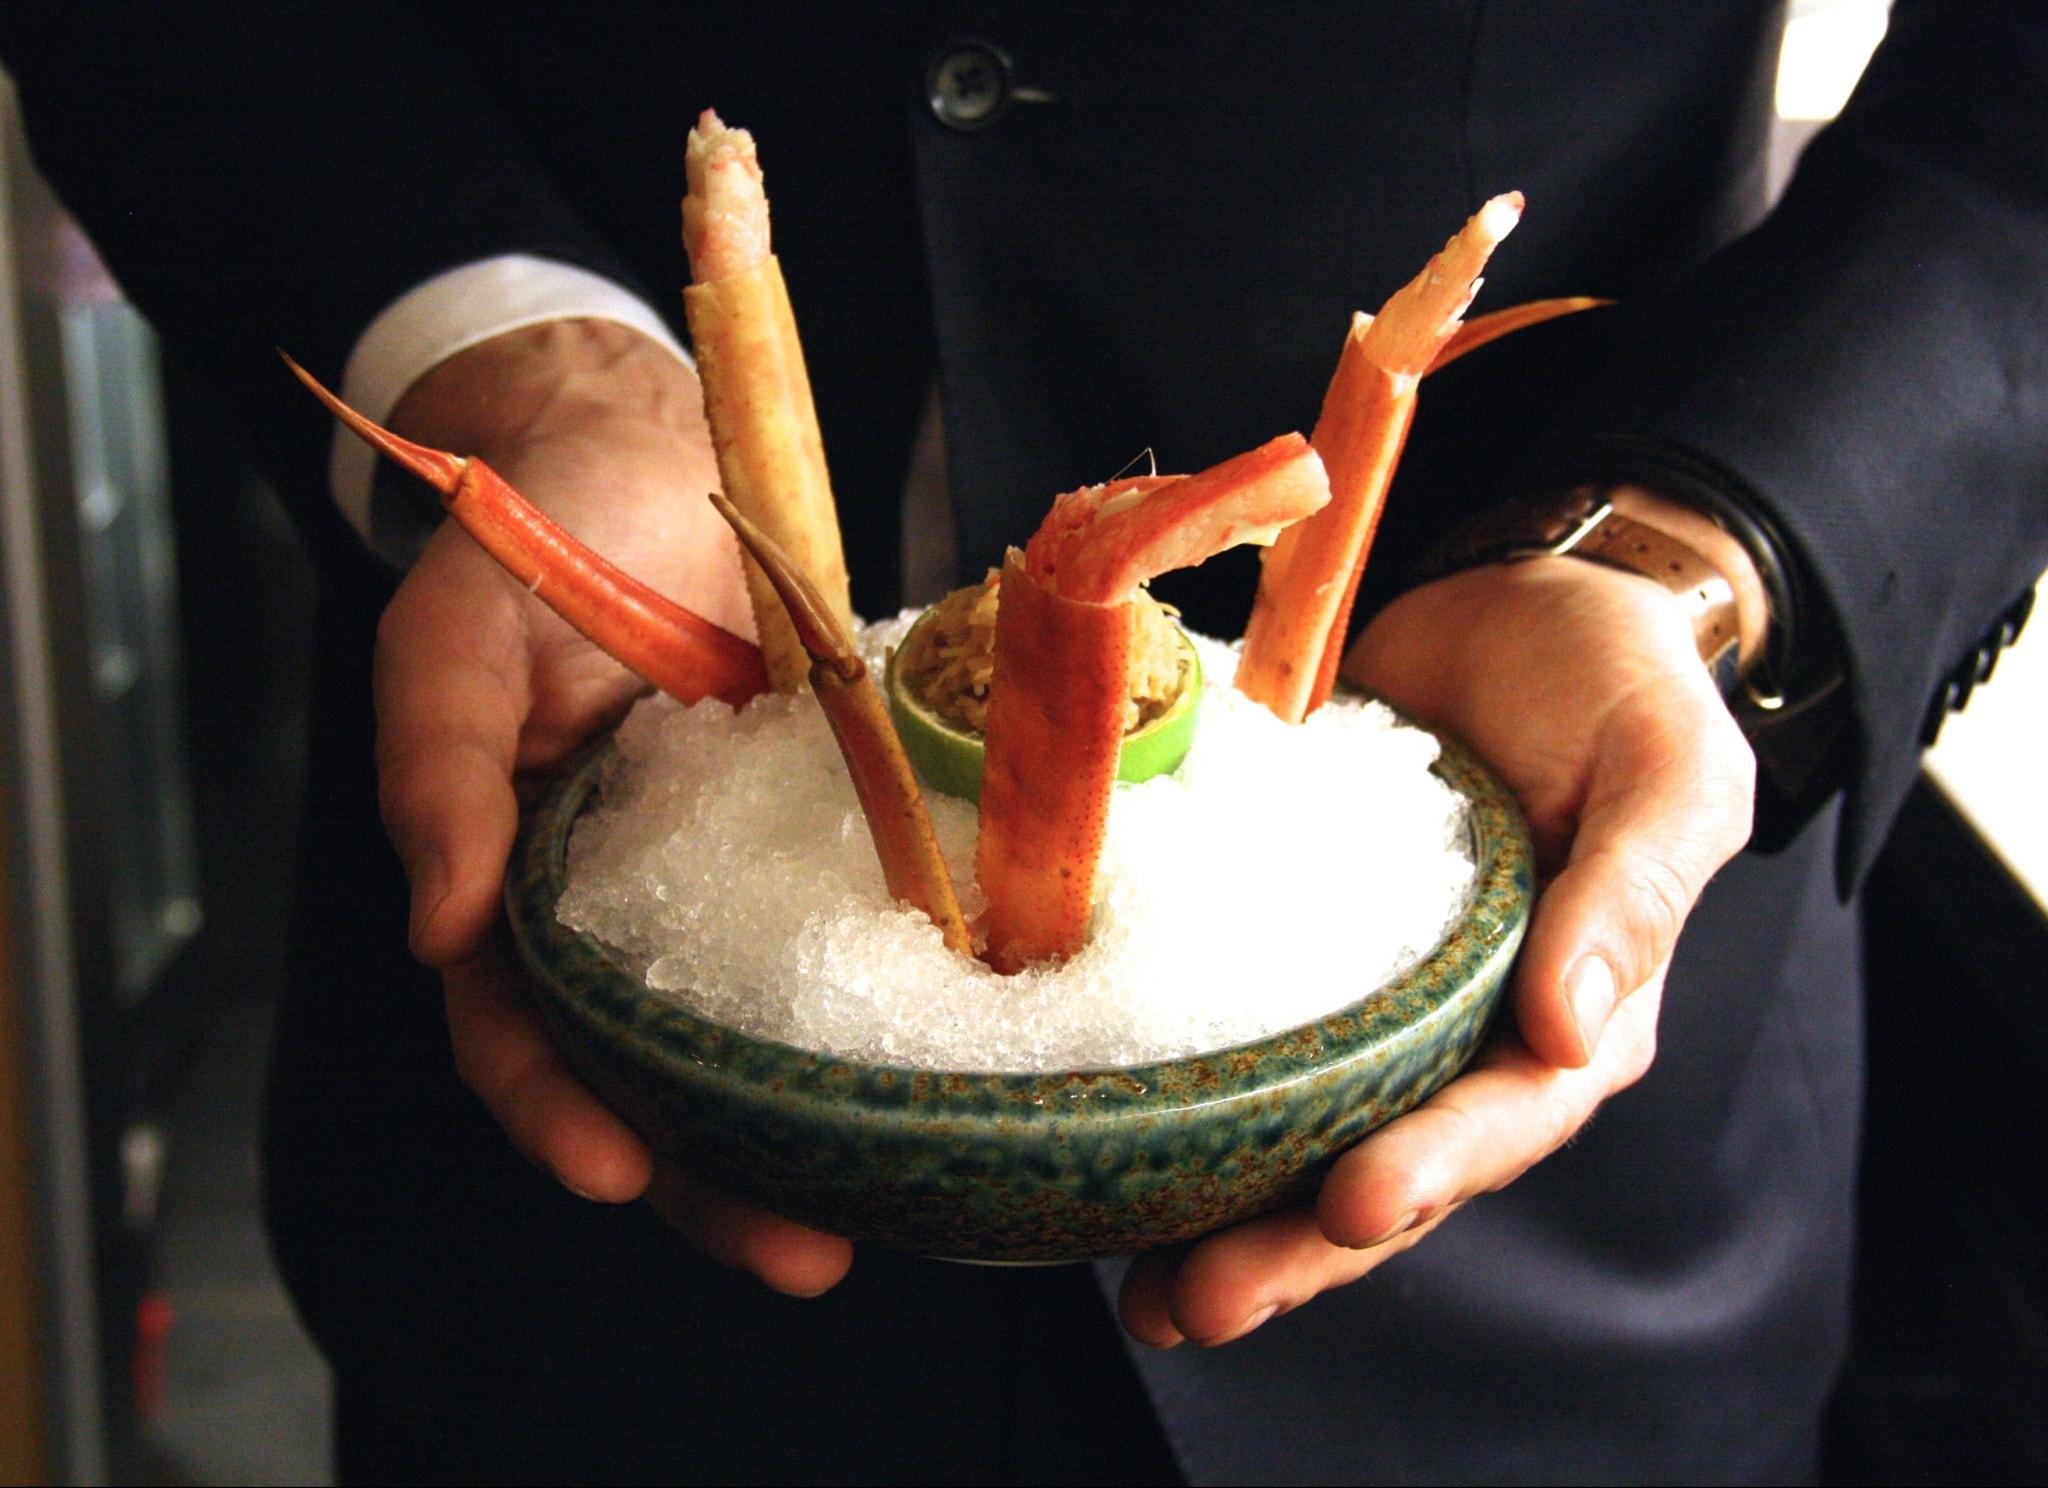 IMG 6889 e1455782581925 - Restaurant Izakaya - Masterclass Shogatsu